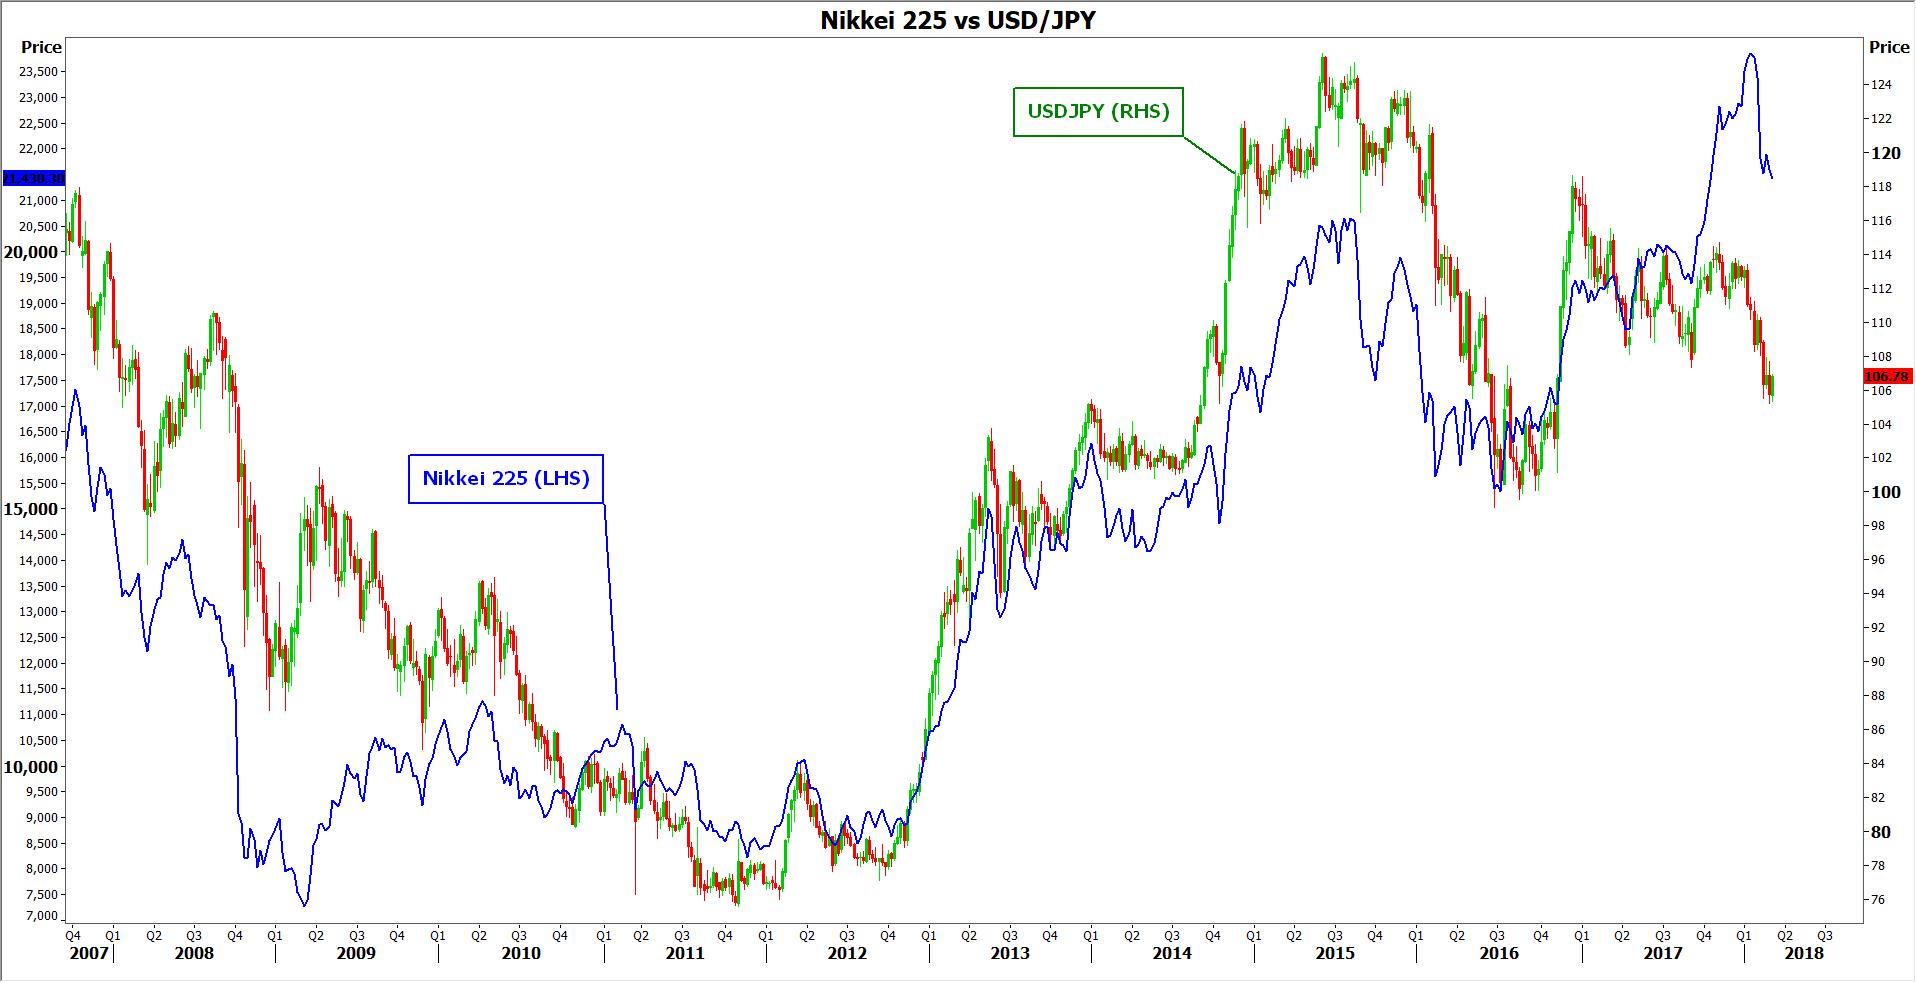 nikkei vs JPY | EconAlerts